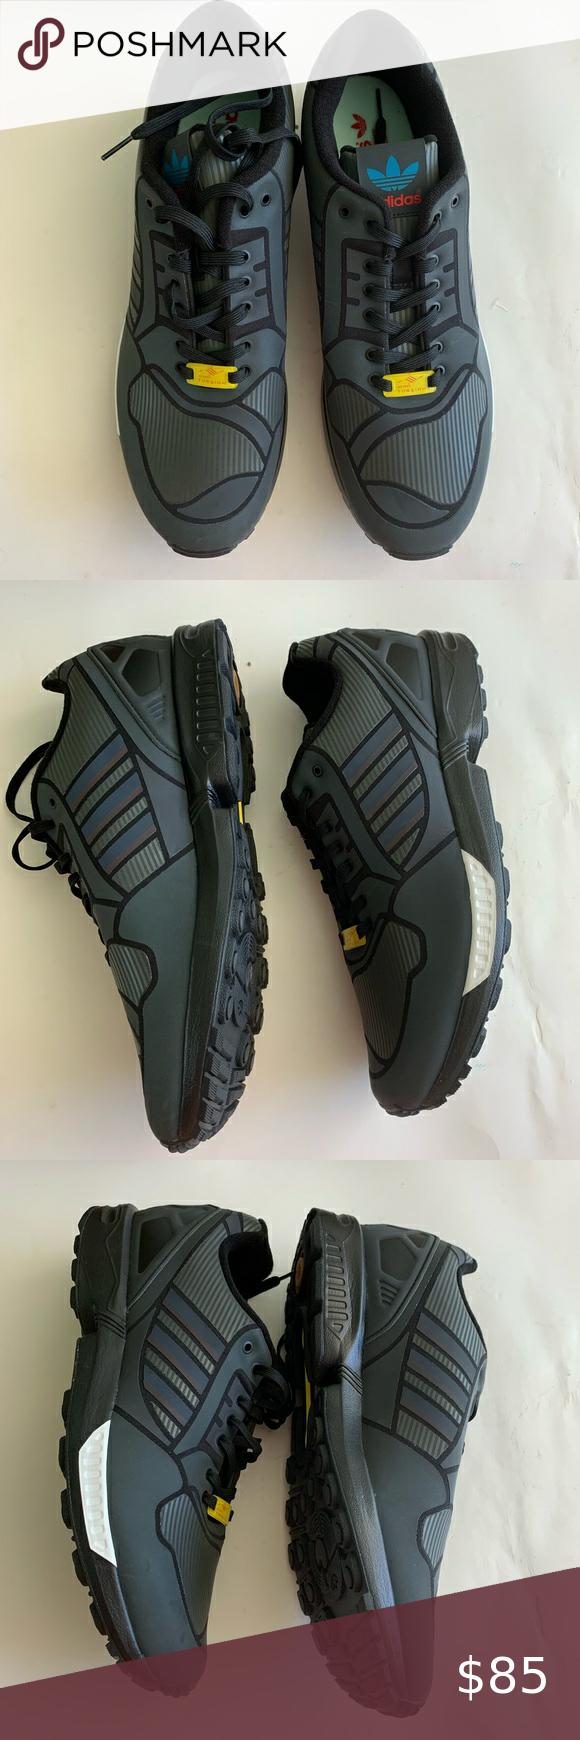 NWB Adidas ZX Flux B54177 men's size 12